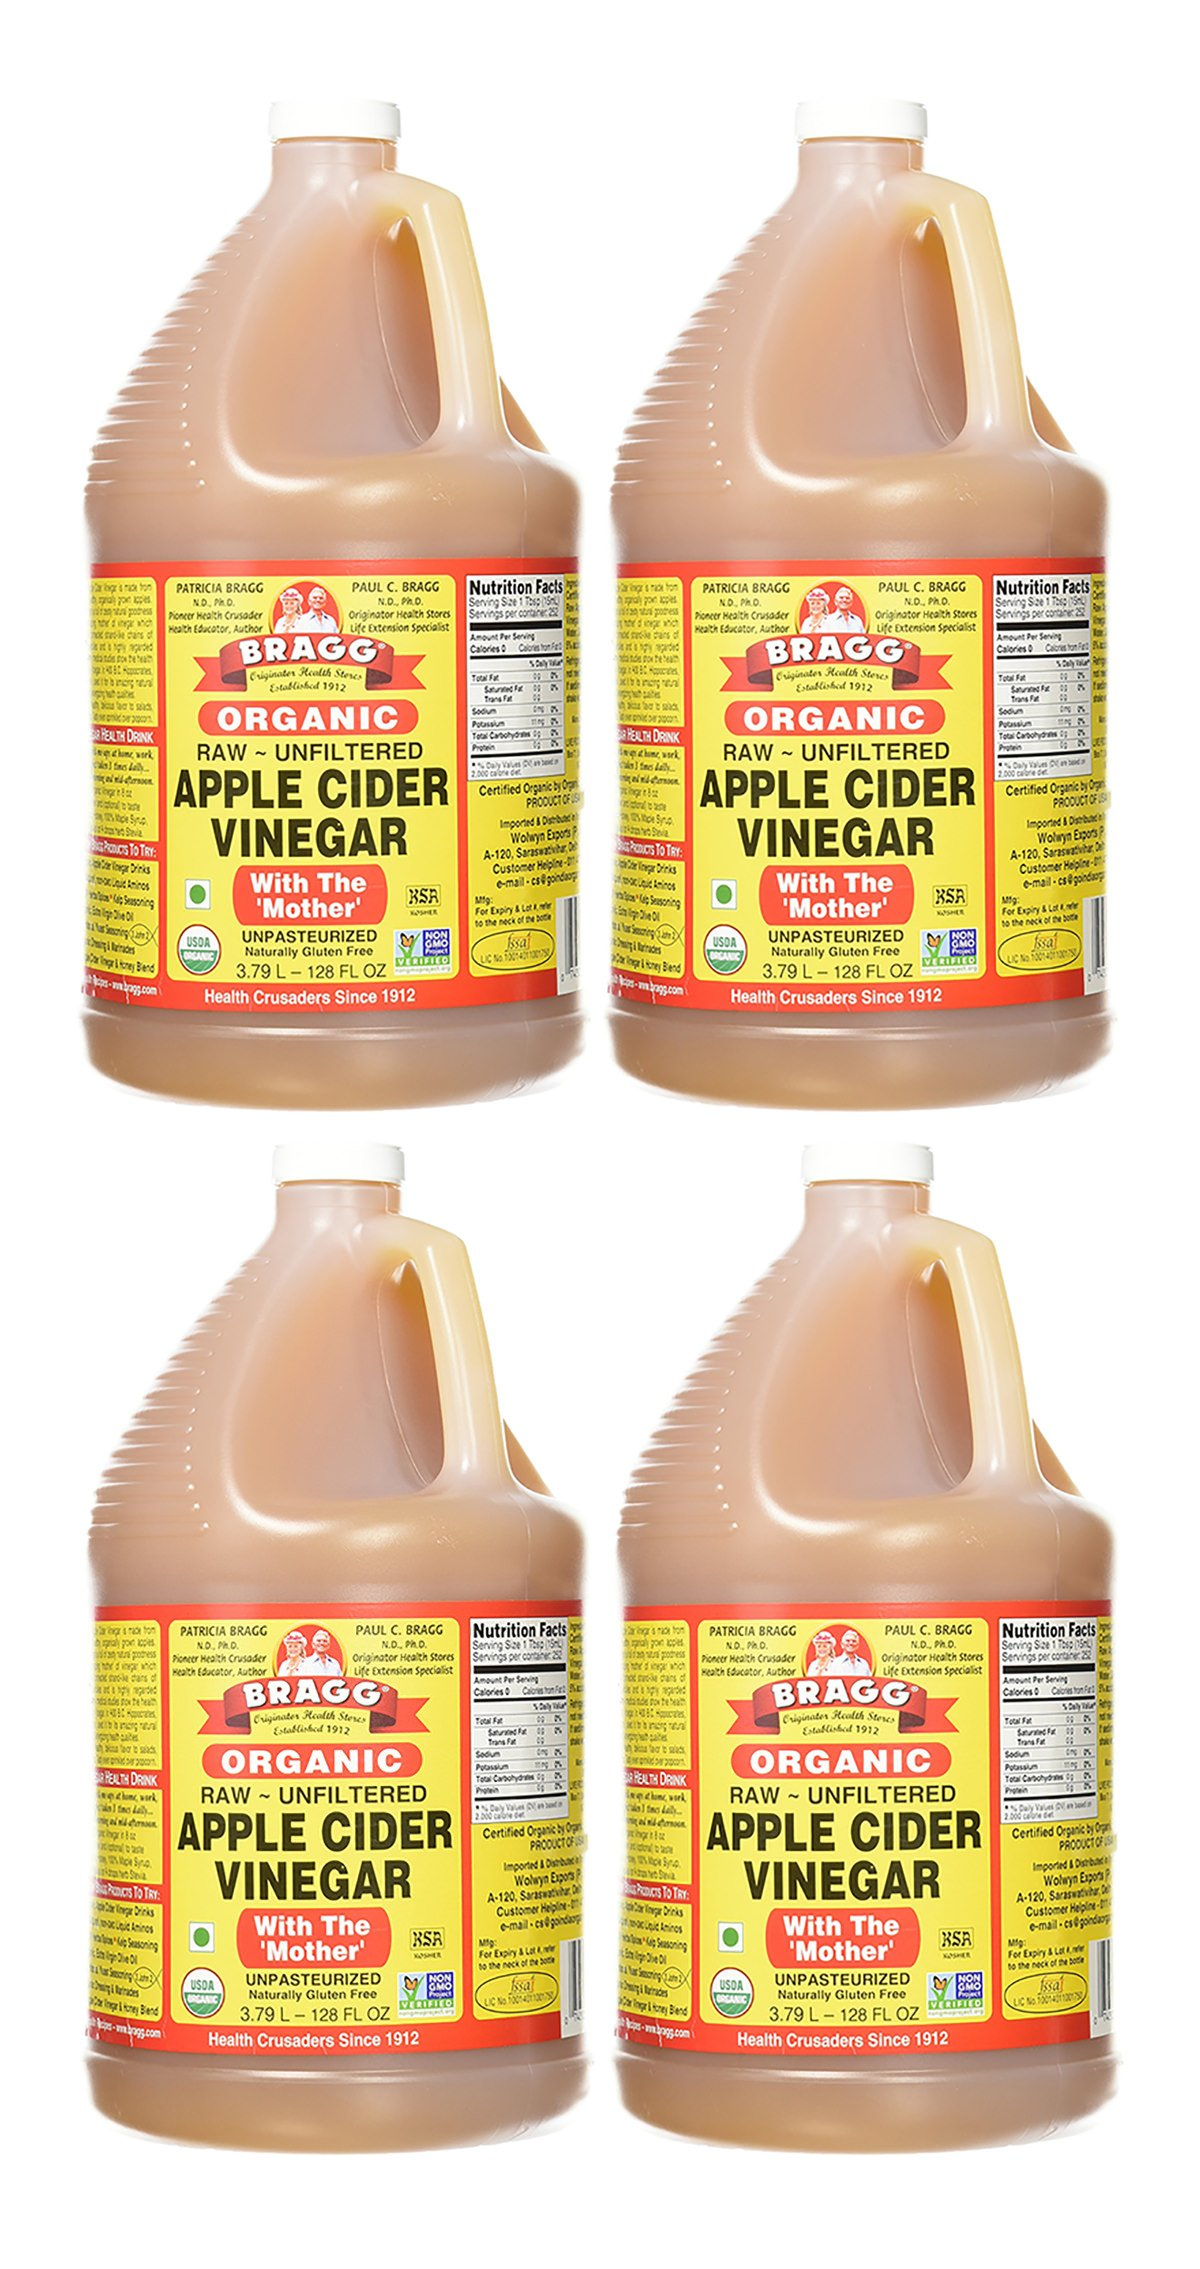 Bragg Organic Raw Apple Cider Vinegar, 128 Ounce, 4 Gallons